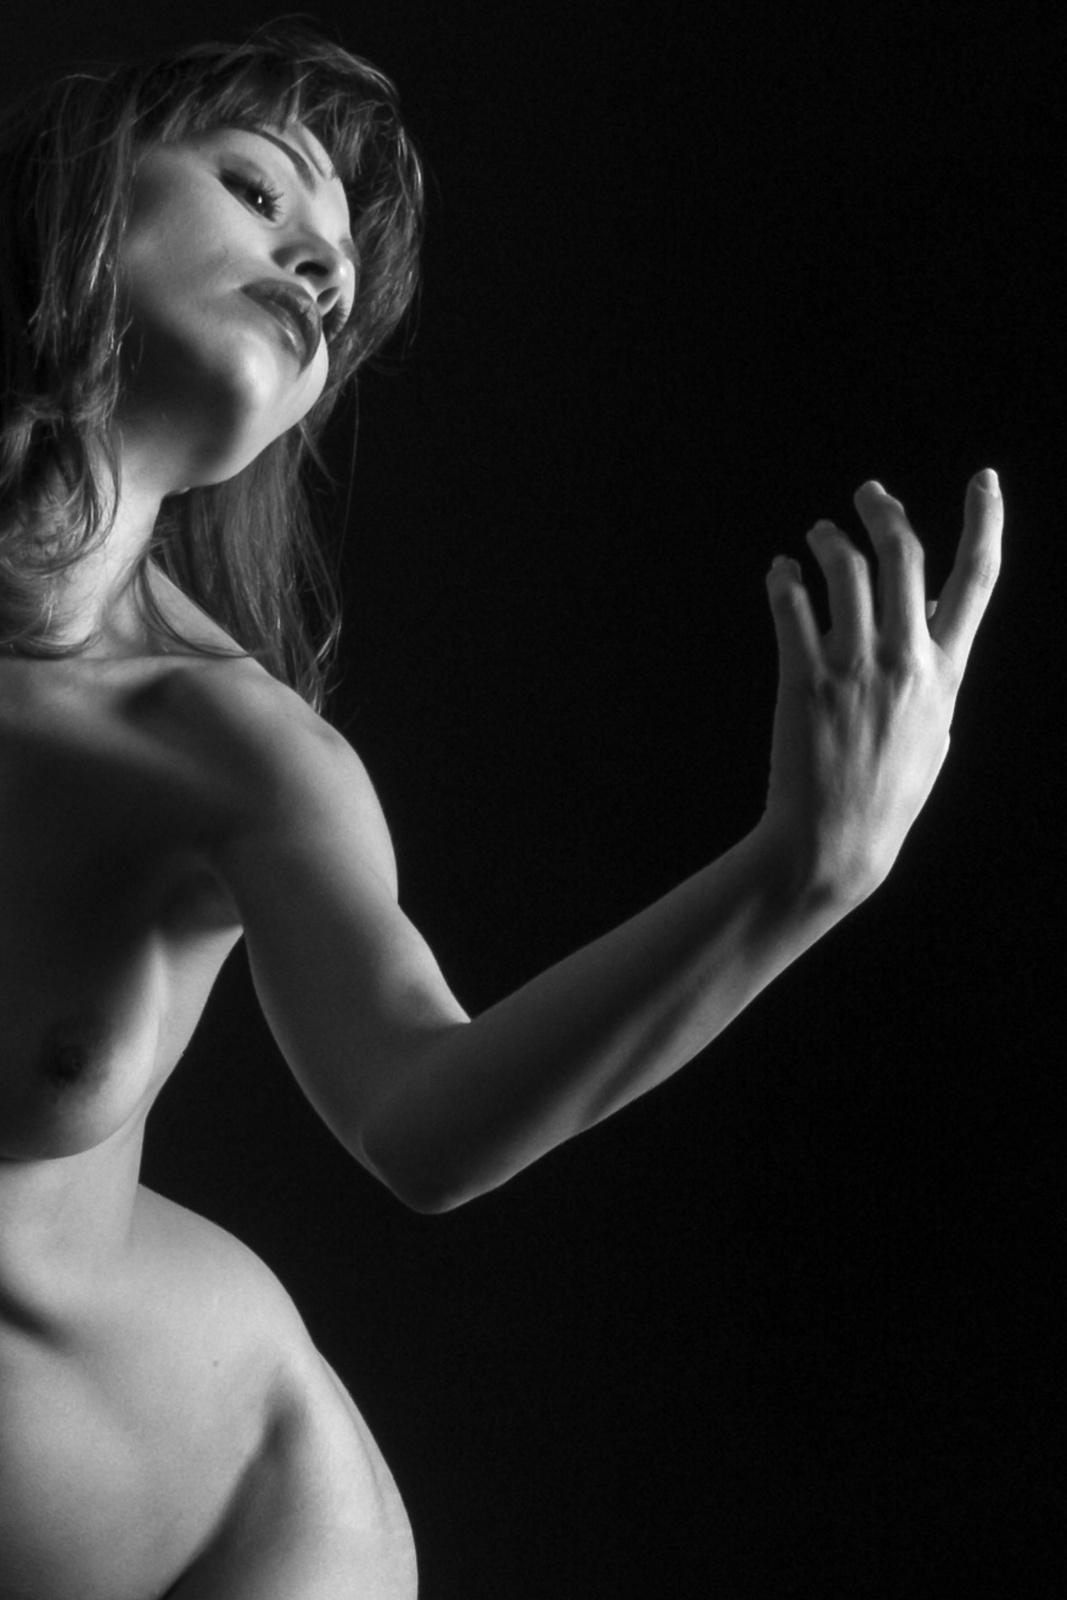 Force sensuality